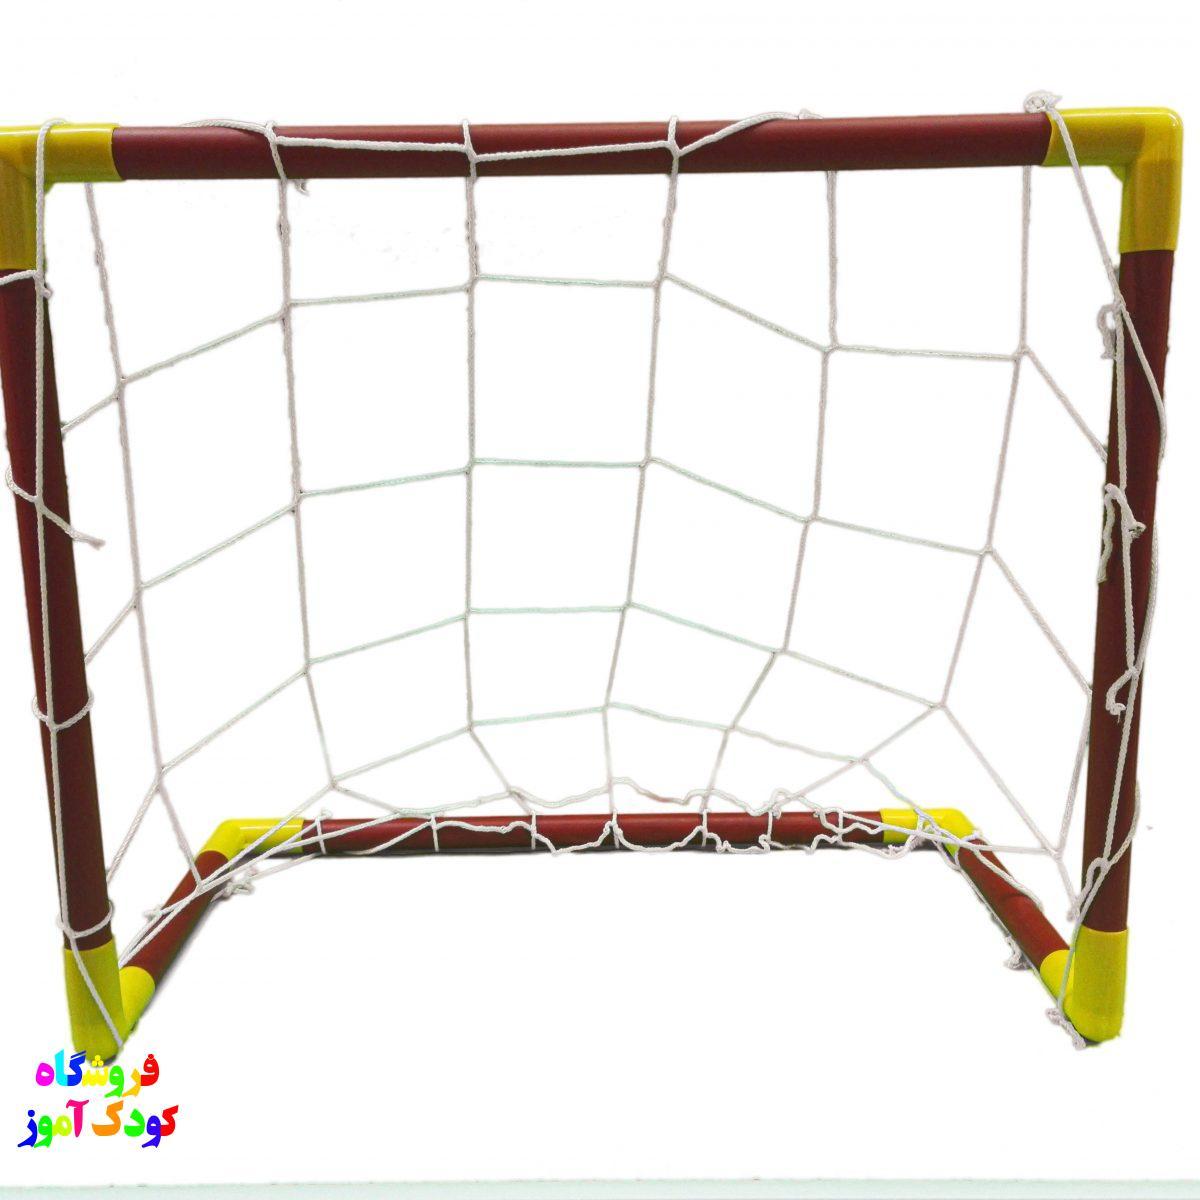 فوتبال 1 1200x1200 - پیشنهاد ویژه